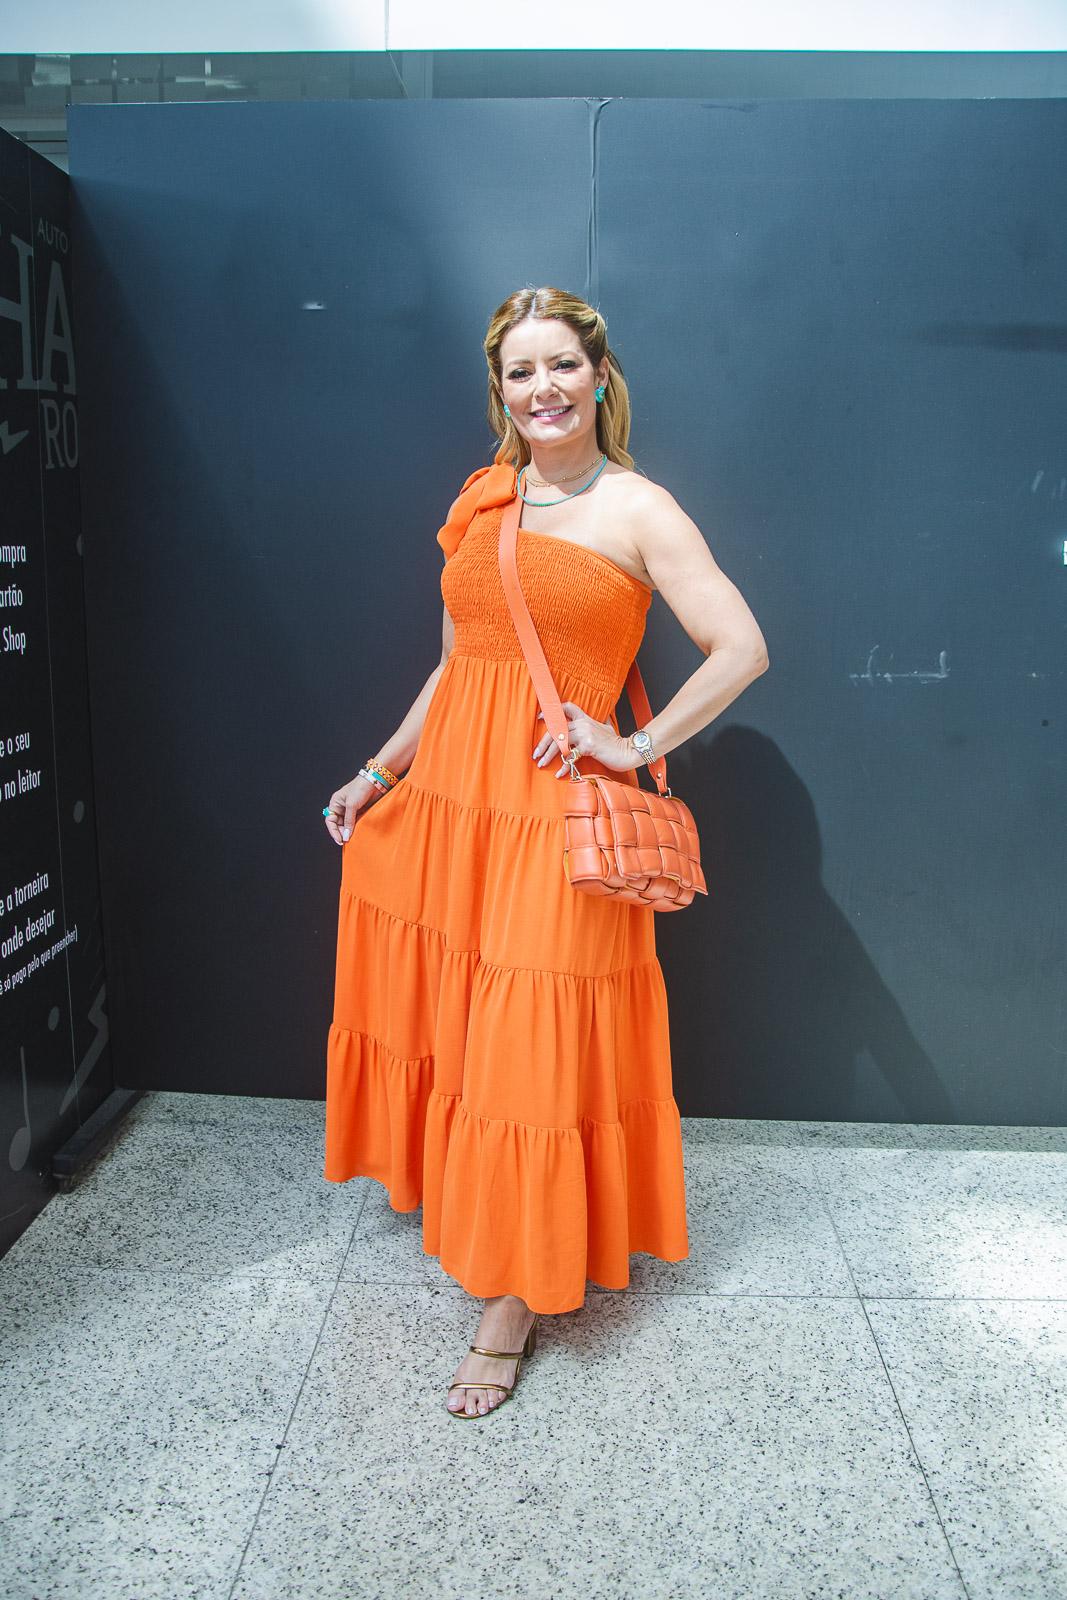 Tatiana Luna